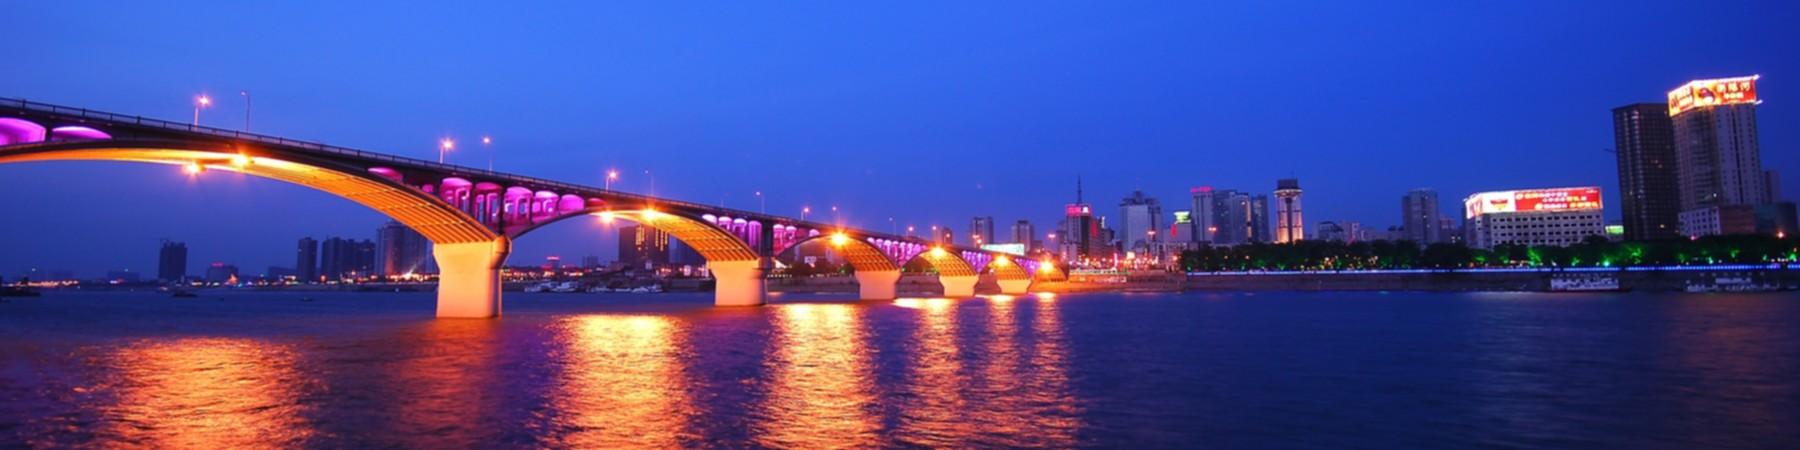 Changsha - Wikitravel